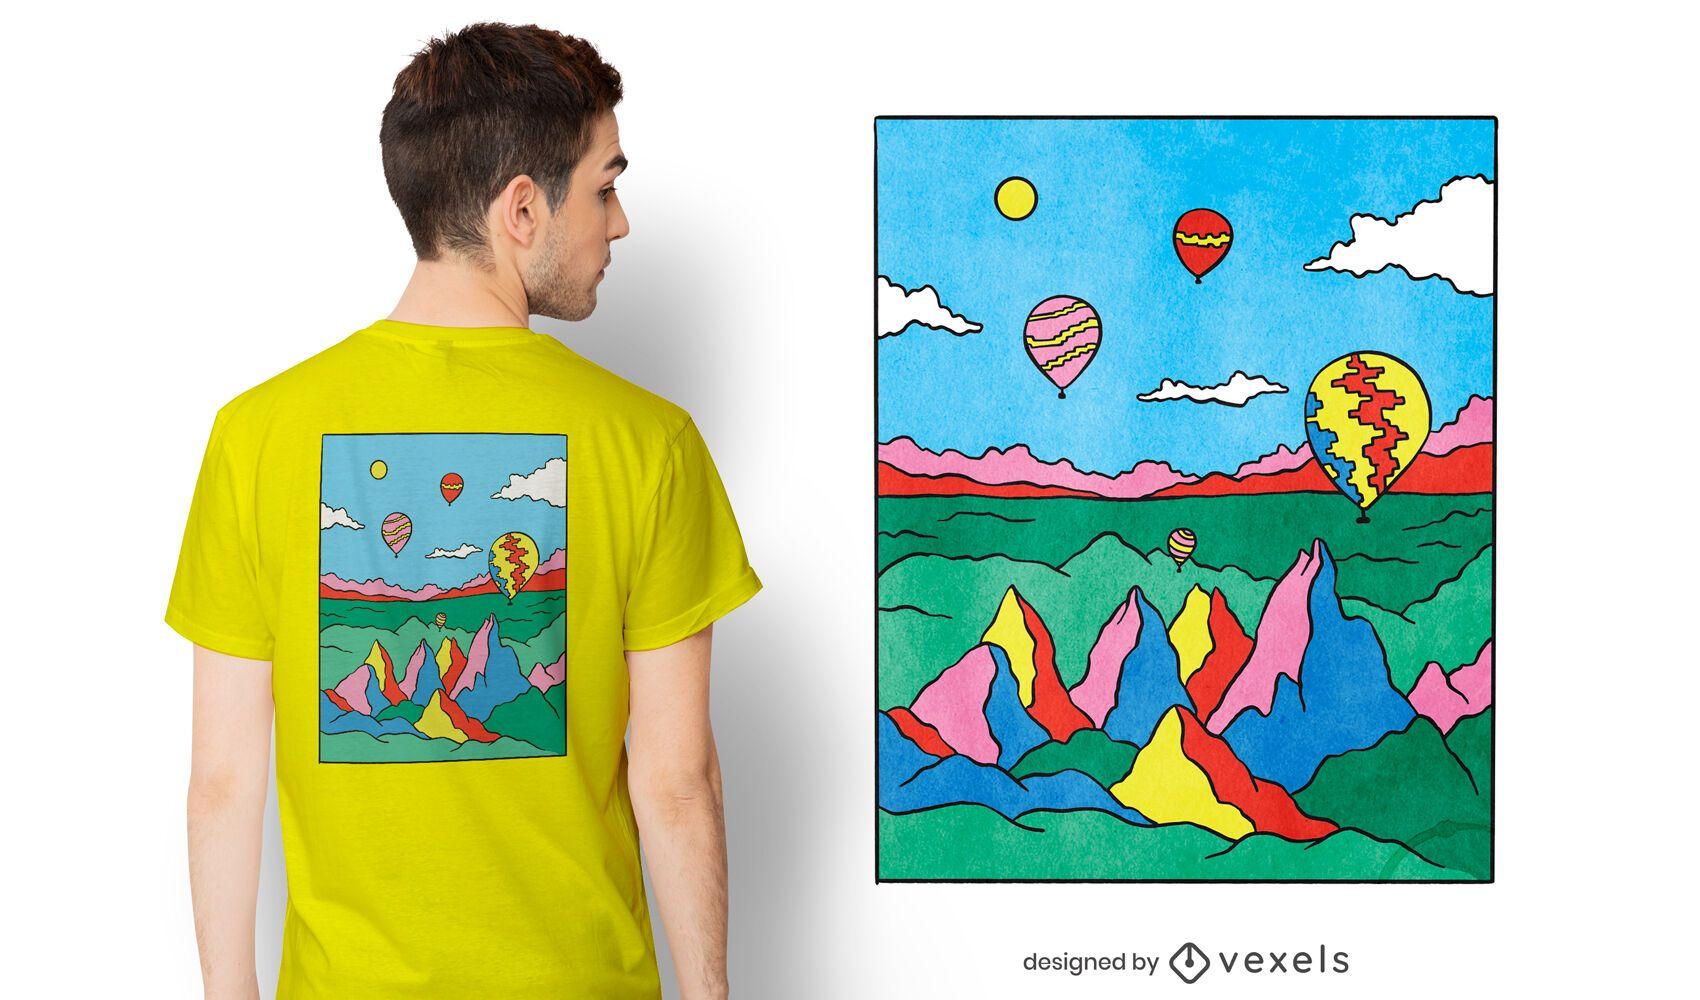 Colorful capadocia t-shirt design